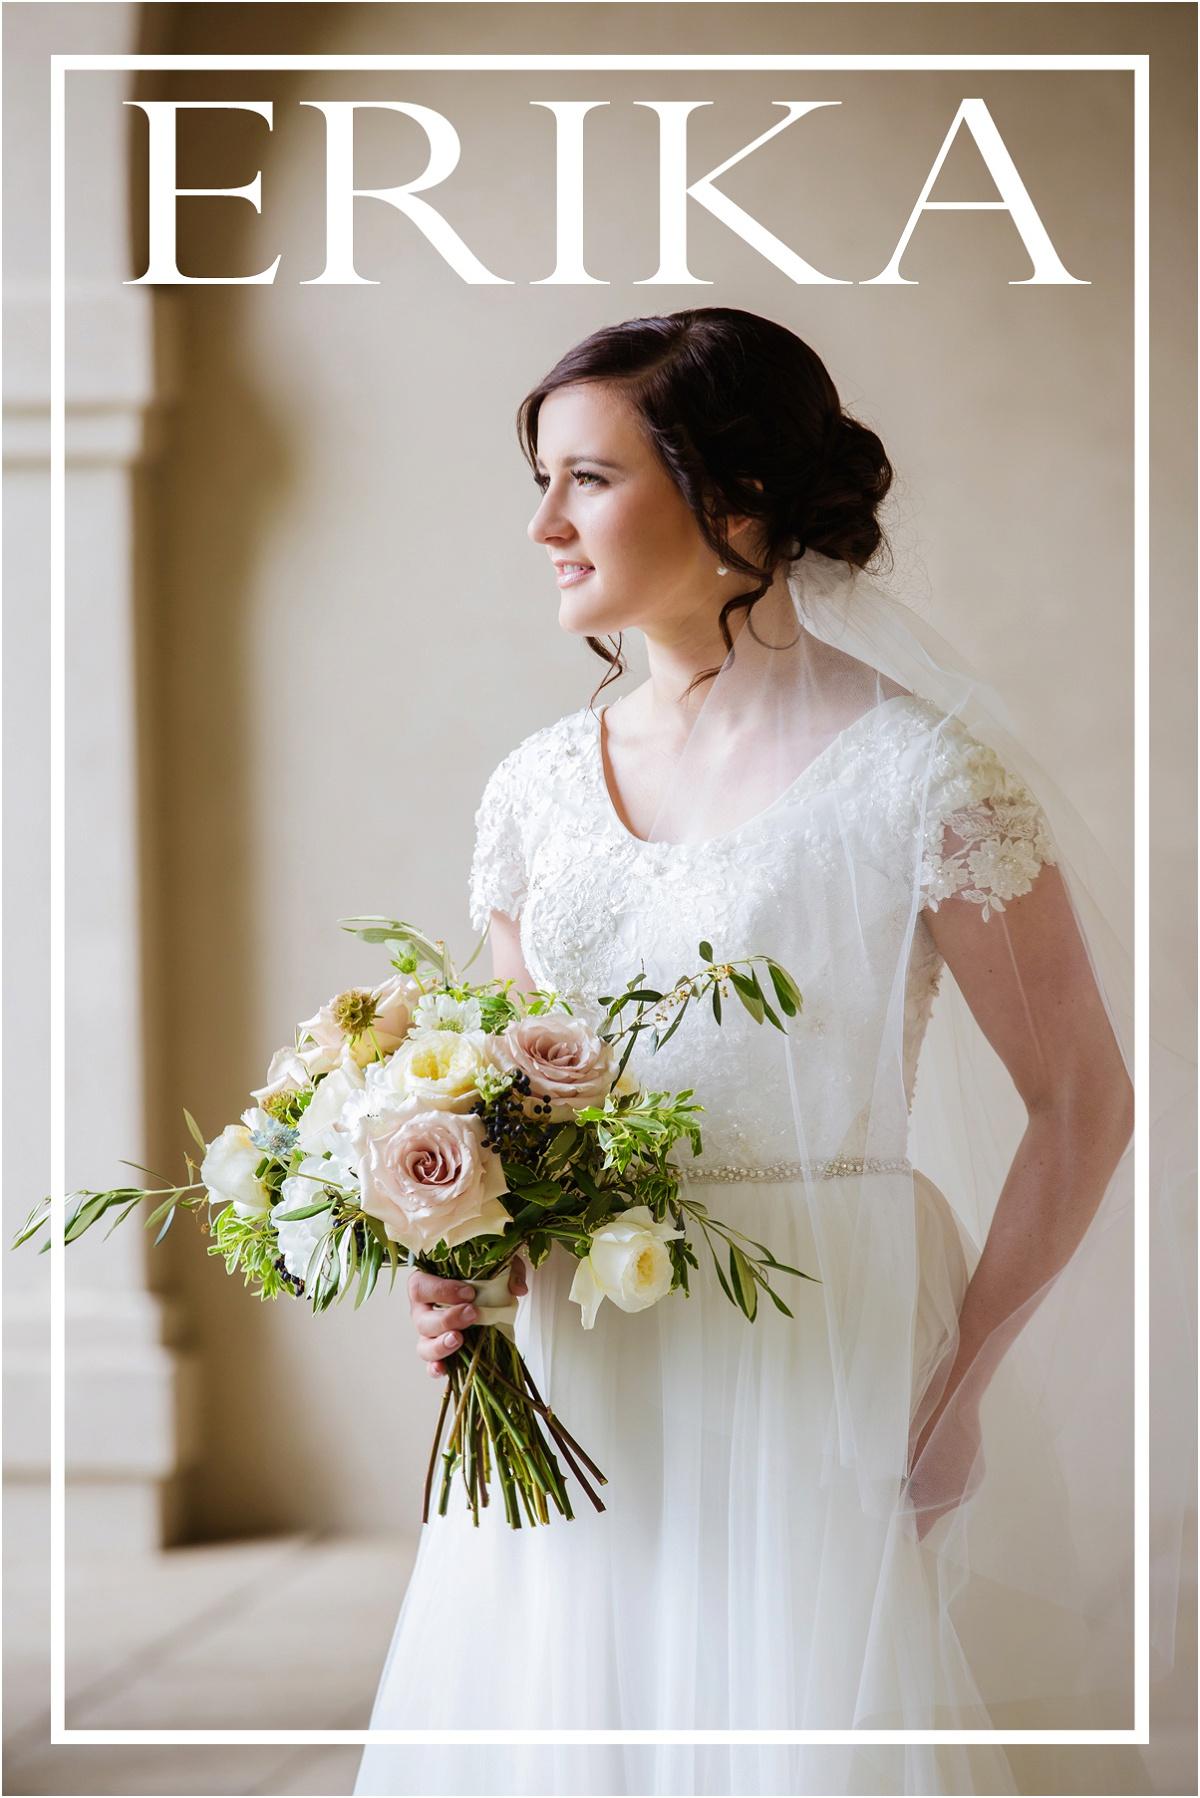 Terra Cooper Photography Weddings Brides 2015_5361.jpg